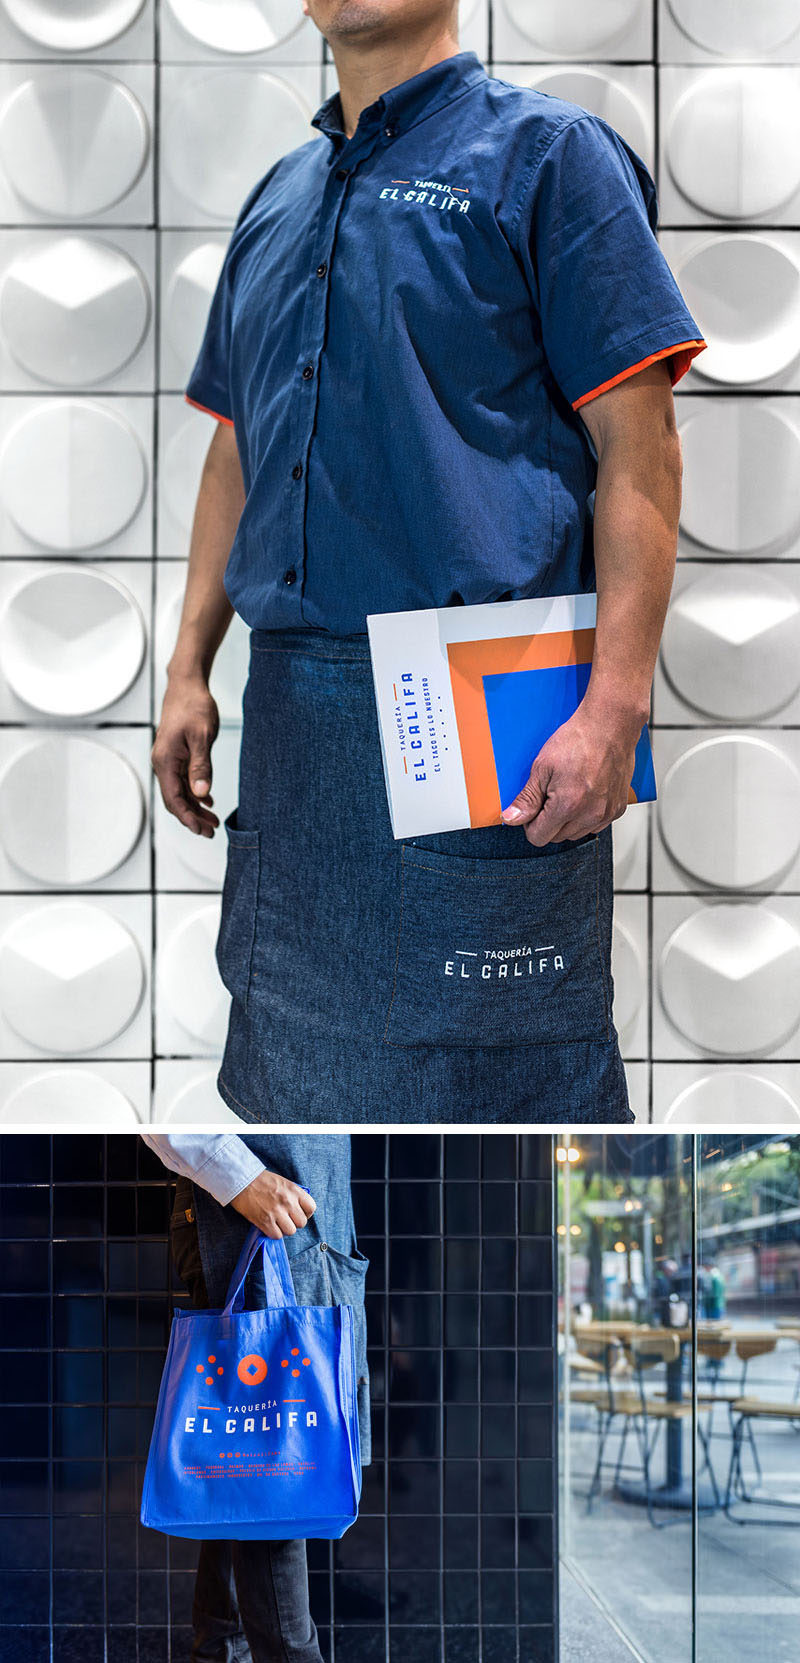 Esrawe Studio designed the branding and interior for El Califa Taqueria, that features dark blue uniforms with a white logo. #Branding #RestaurantBranding